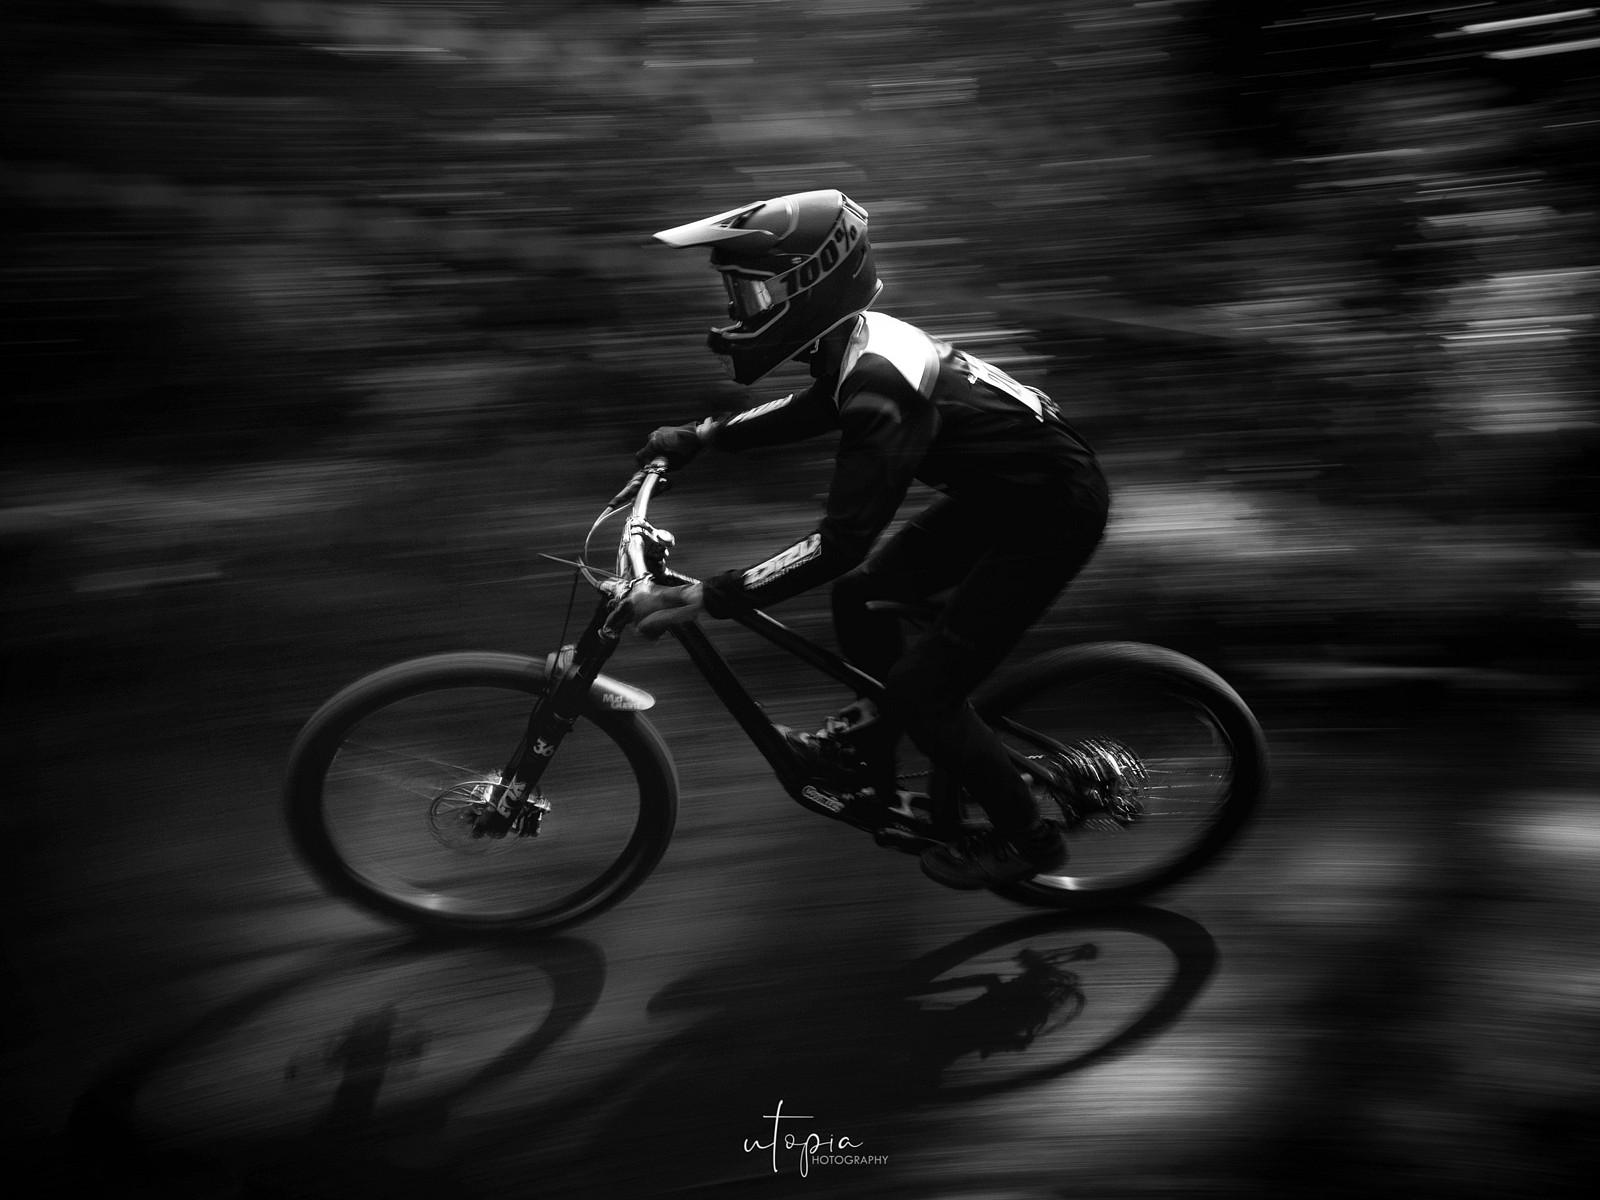 Fast in the dark - utopiaarch - Mountain Biking Pictures - Vital MTB